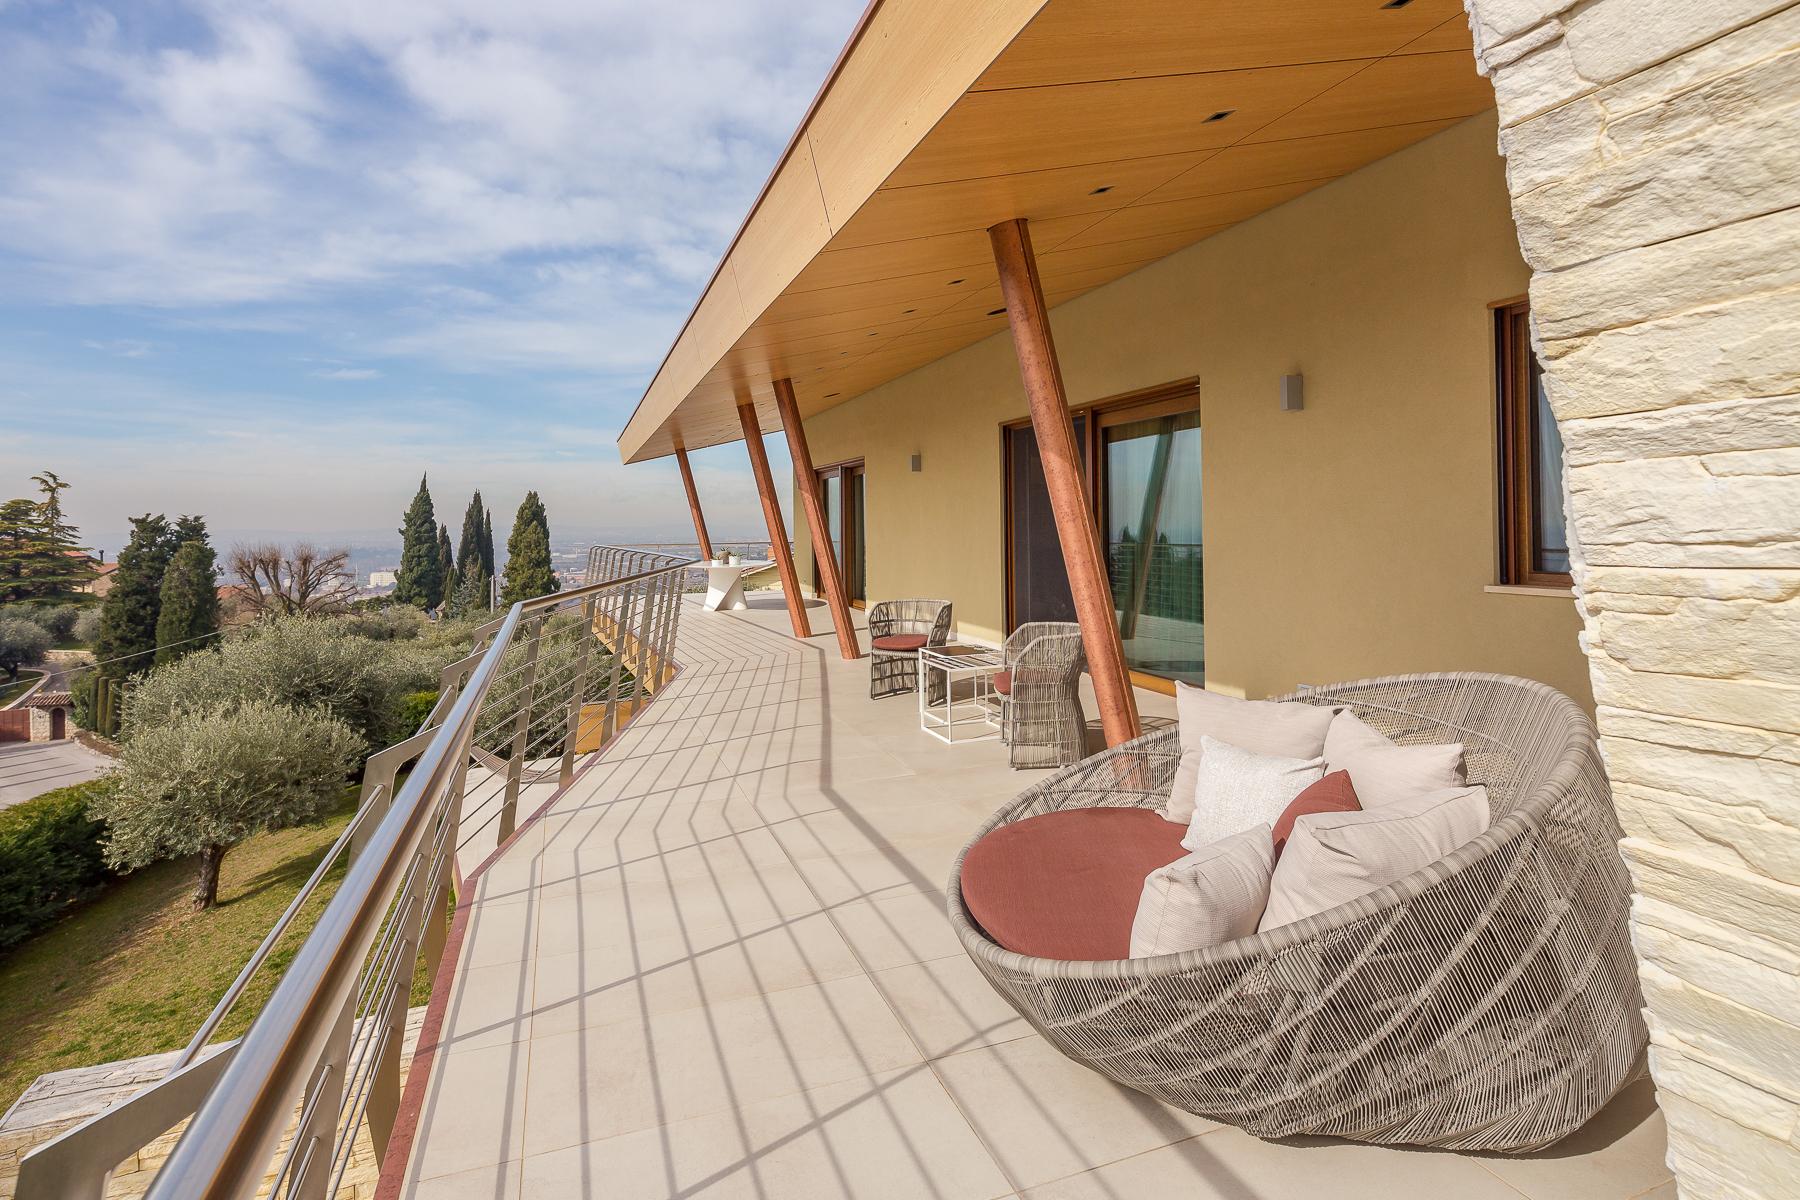 Villa in Vendita a Verona: 5 locali, 630 mq - Foto 13